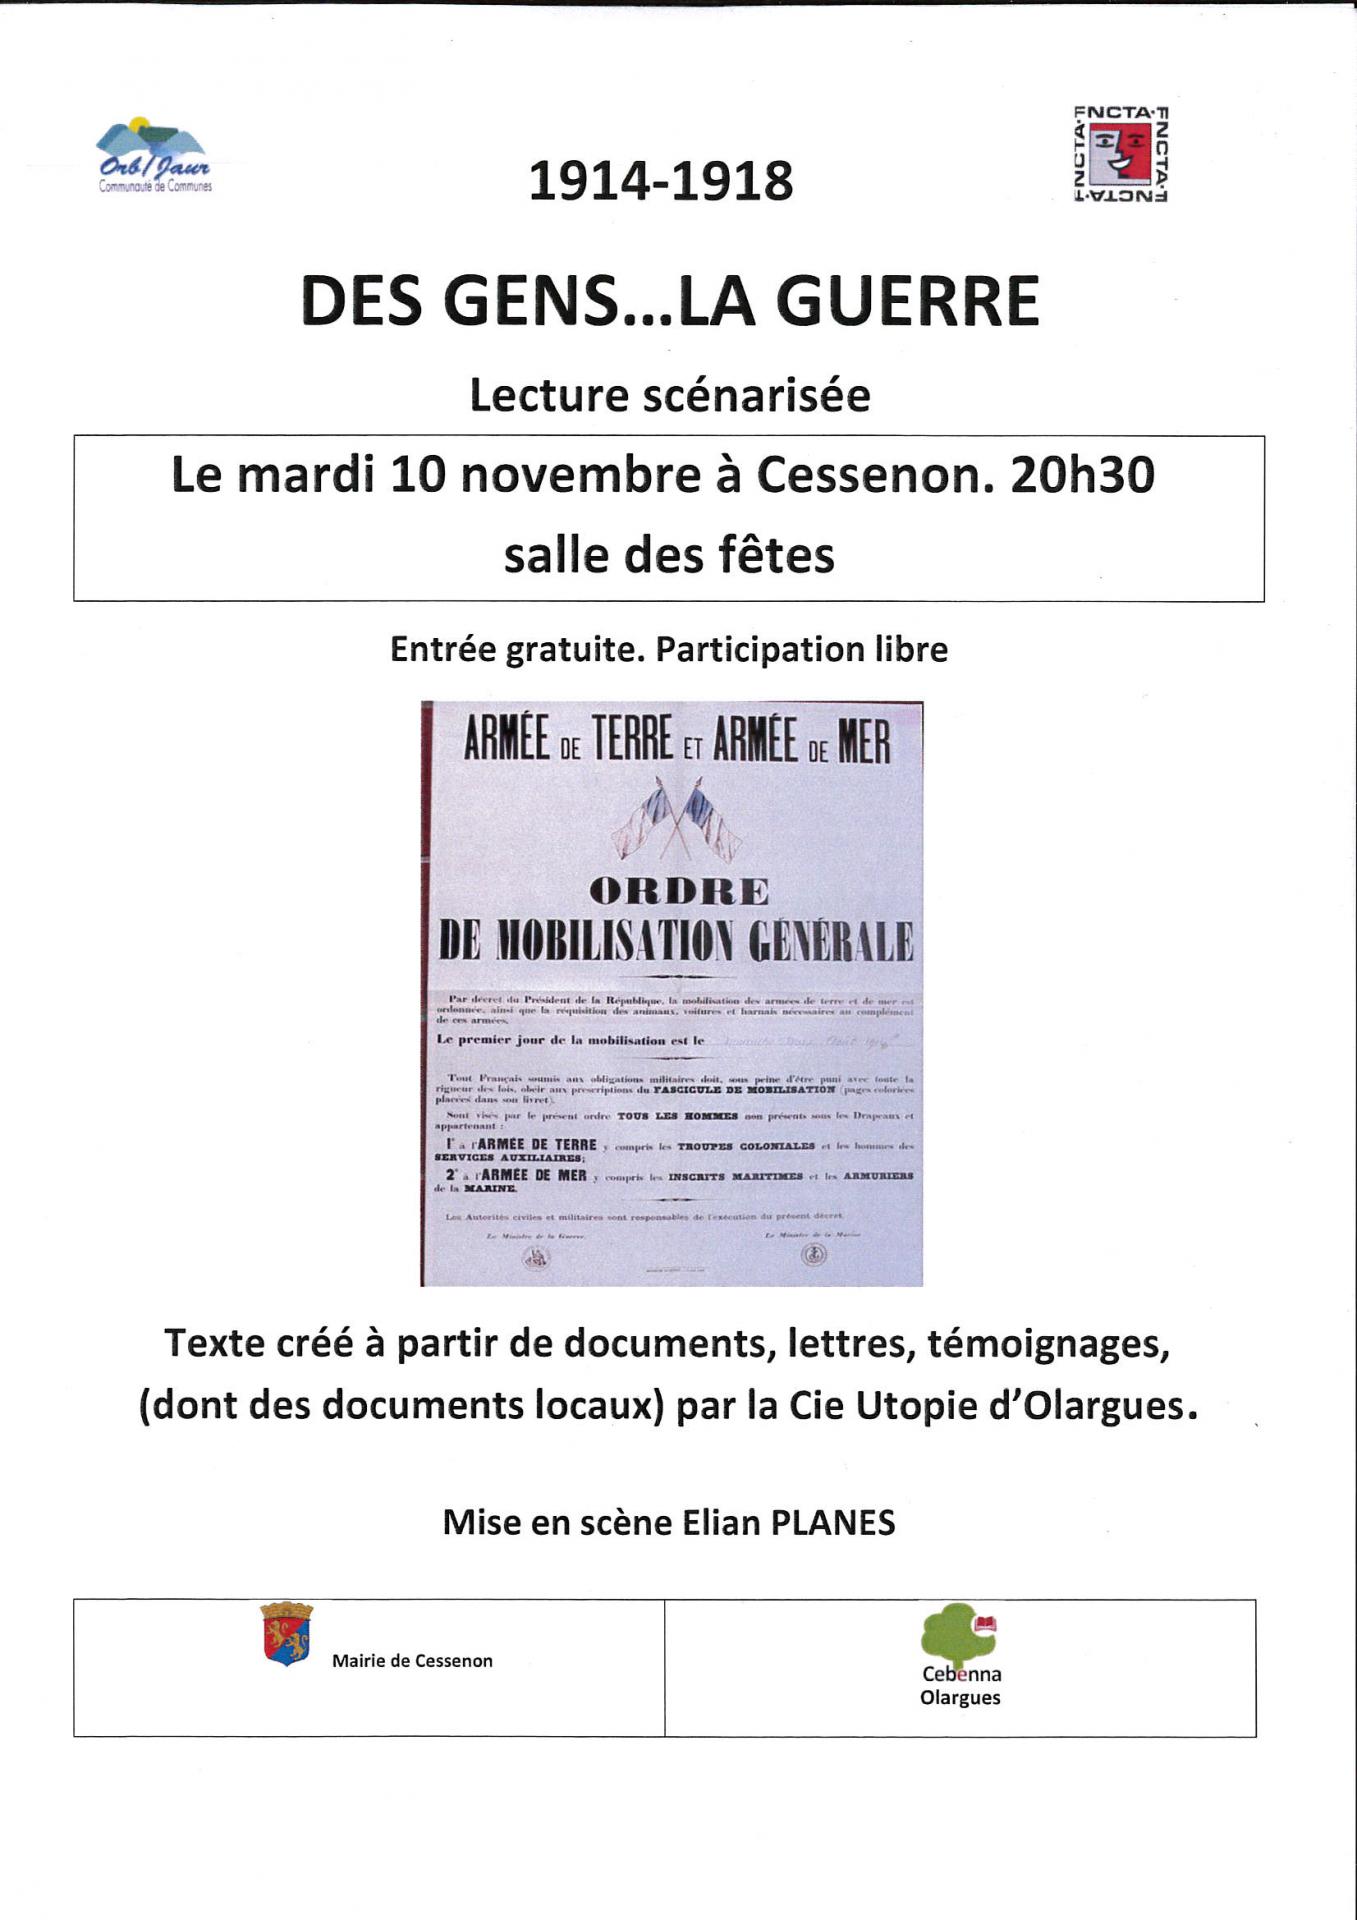 2015 11 10 lecture scenarisee guerre 14 18